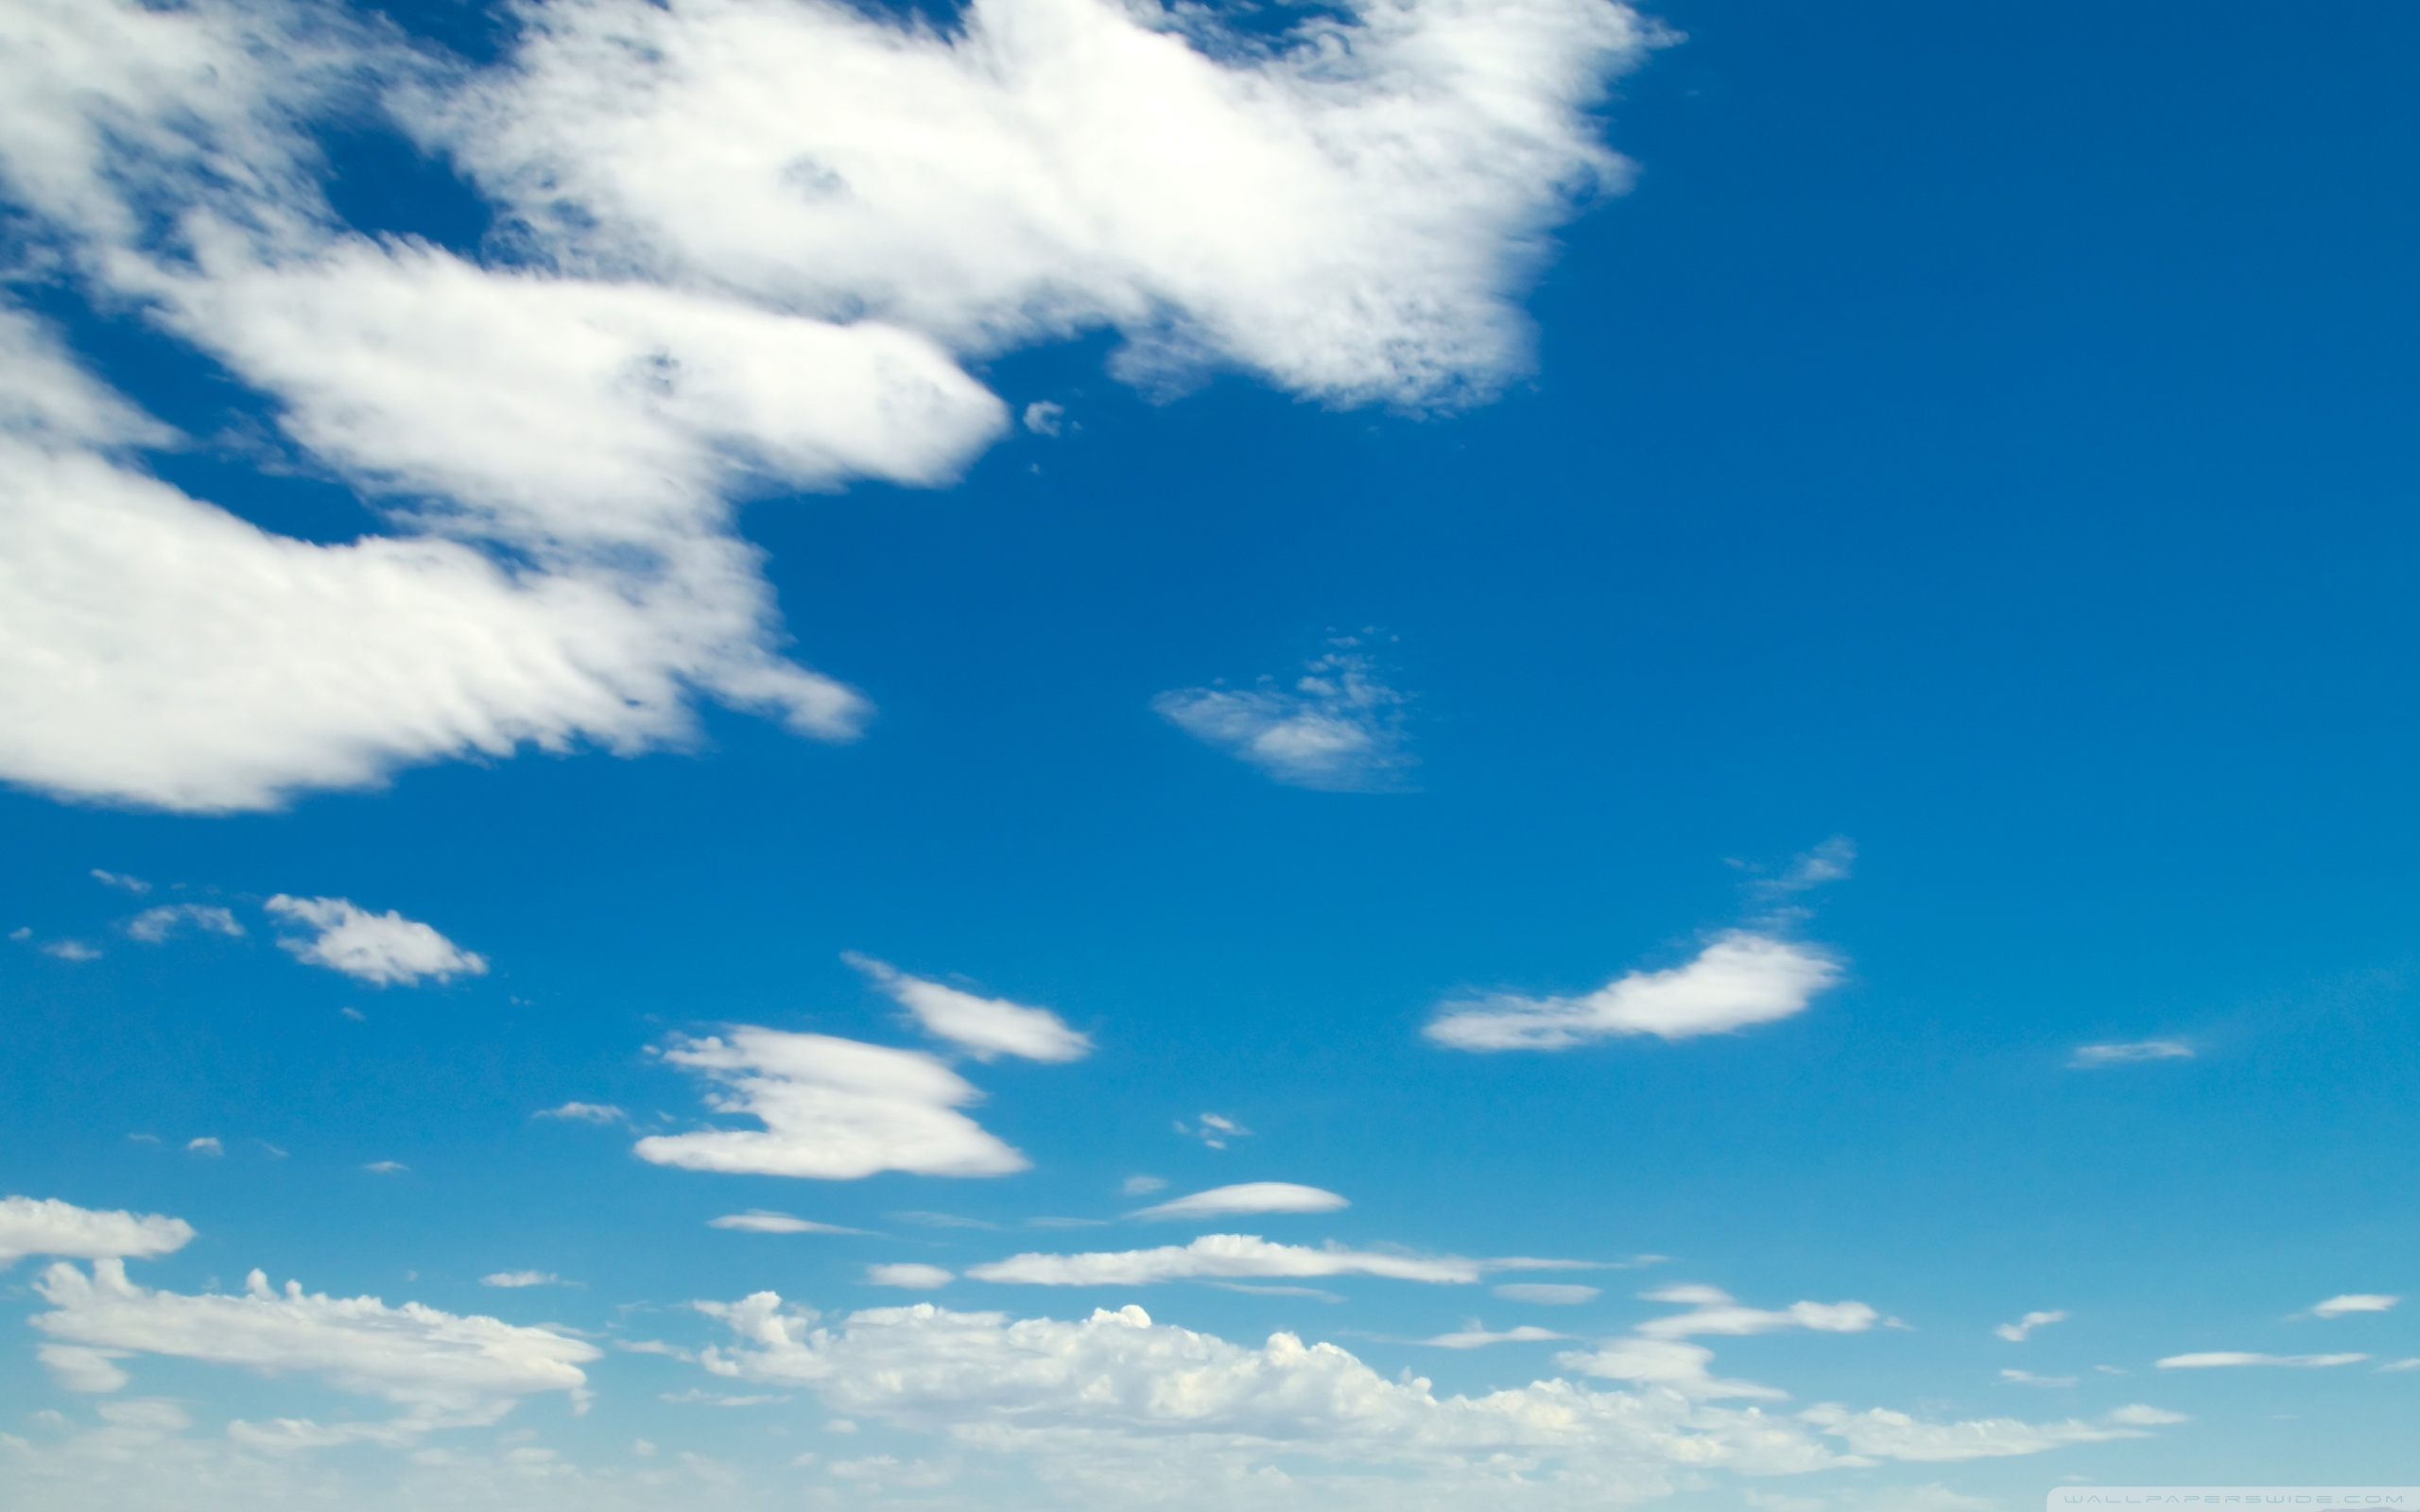 Desert Sky ❤ 4K HD Desktop Wallpaper for 4K Ultra HD TV • Dual ...